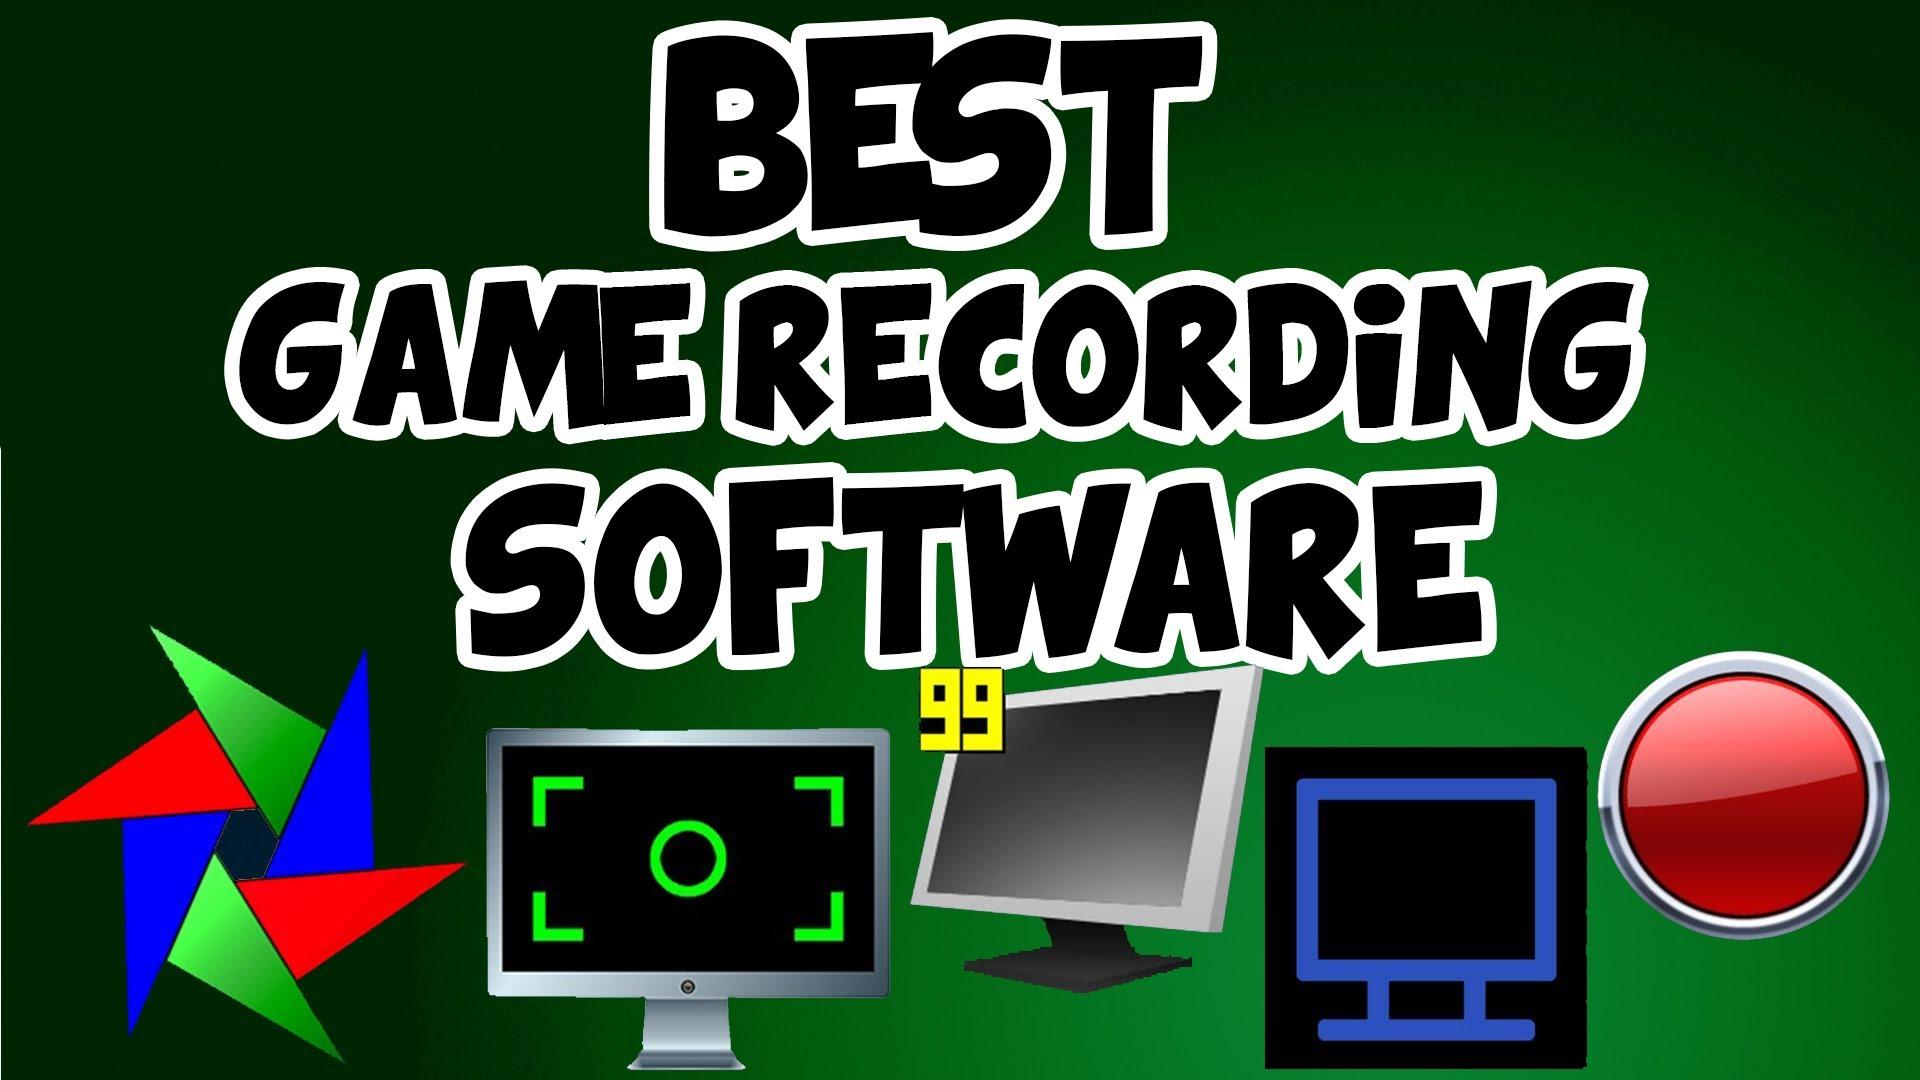 Best Video Capture Software 2015 - 60FPS - YouTube